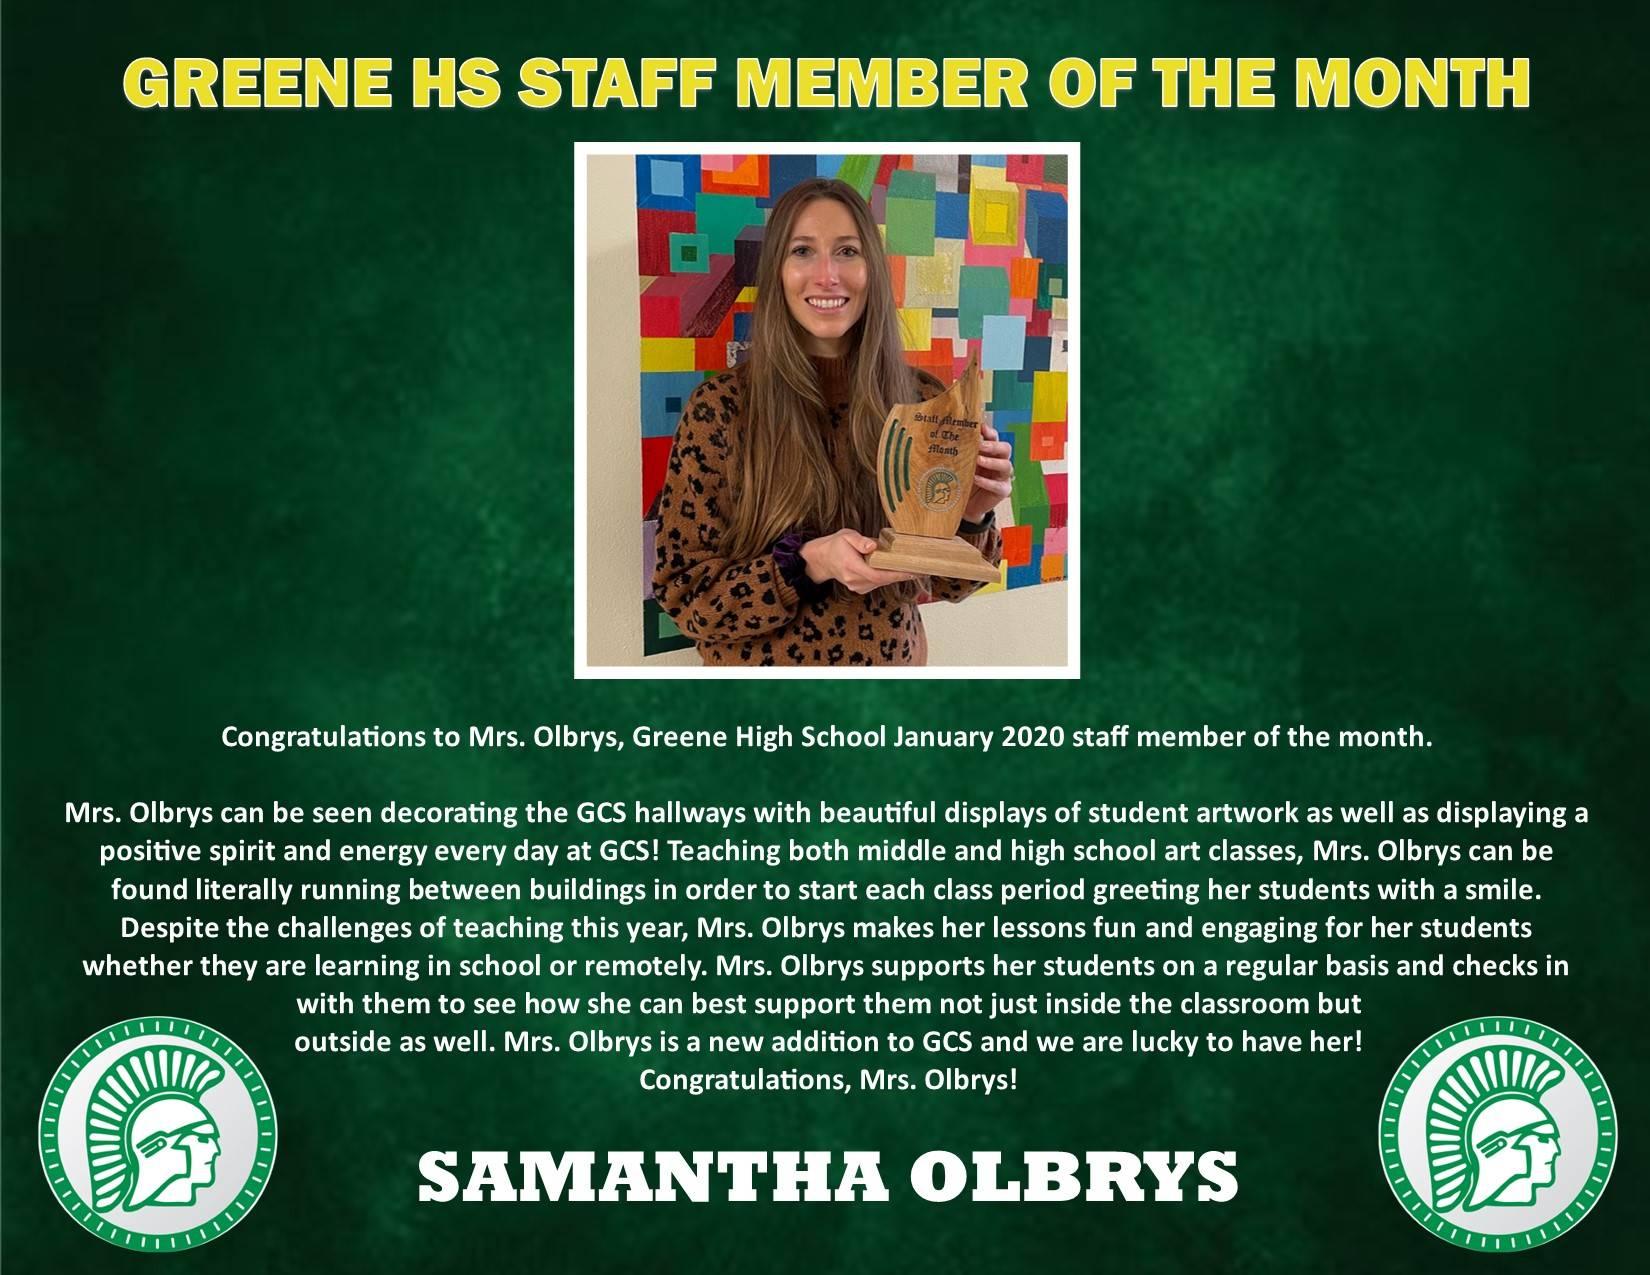 Mrs. Olbrys HS Staff Member of Month Bio